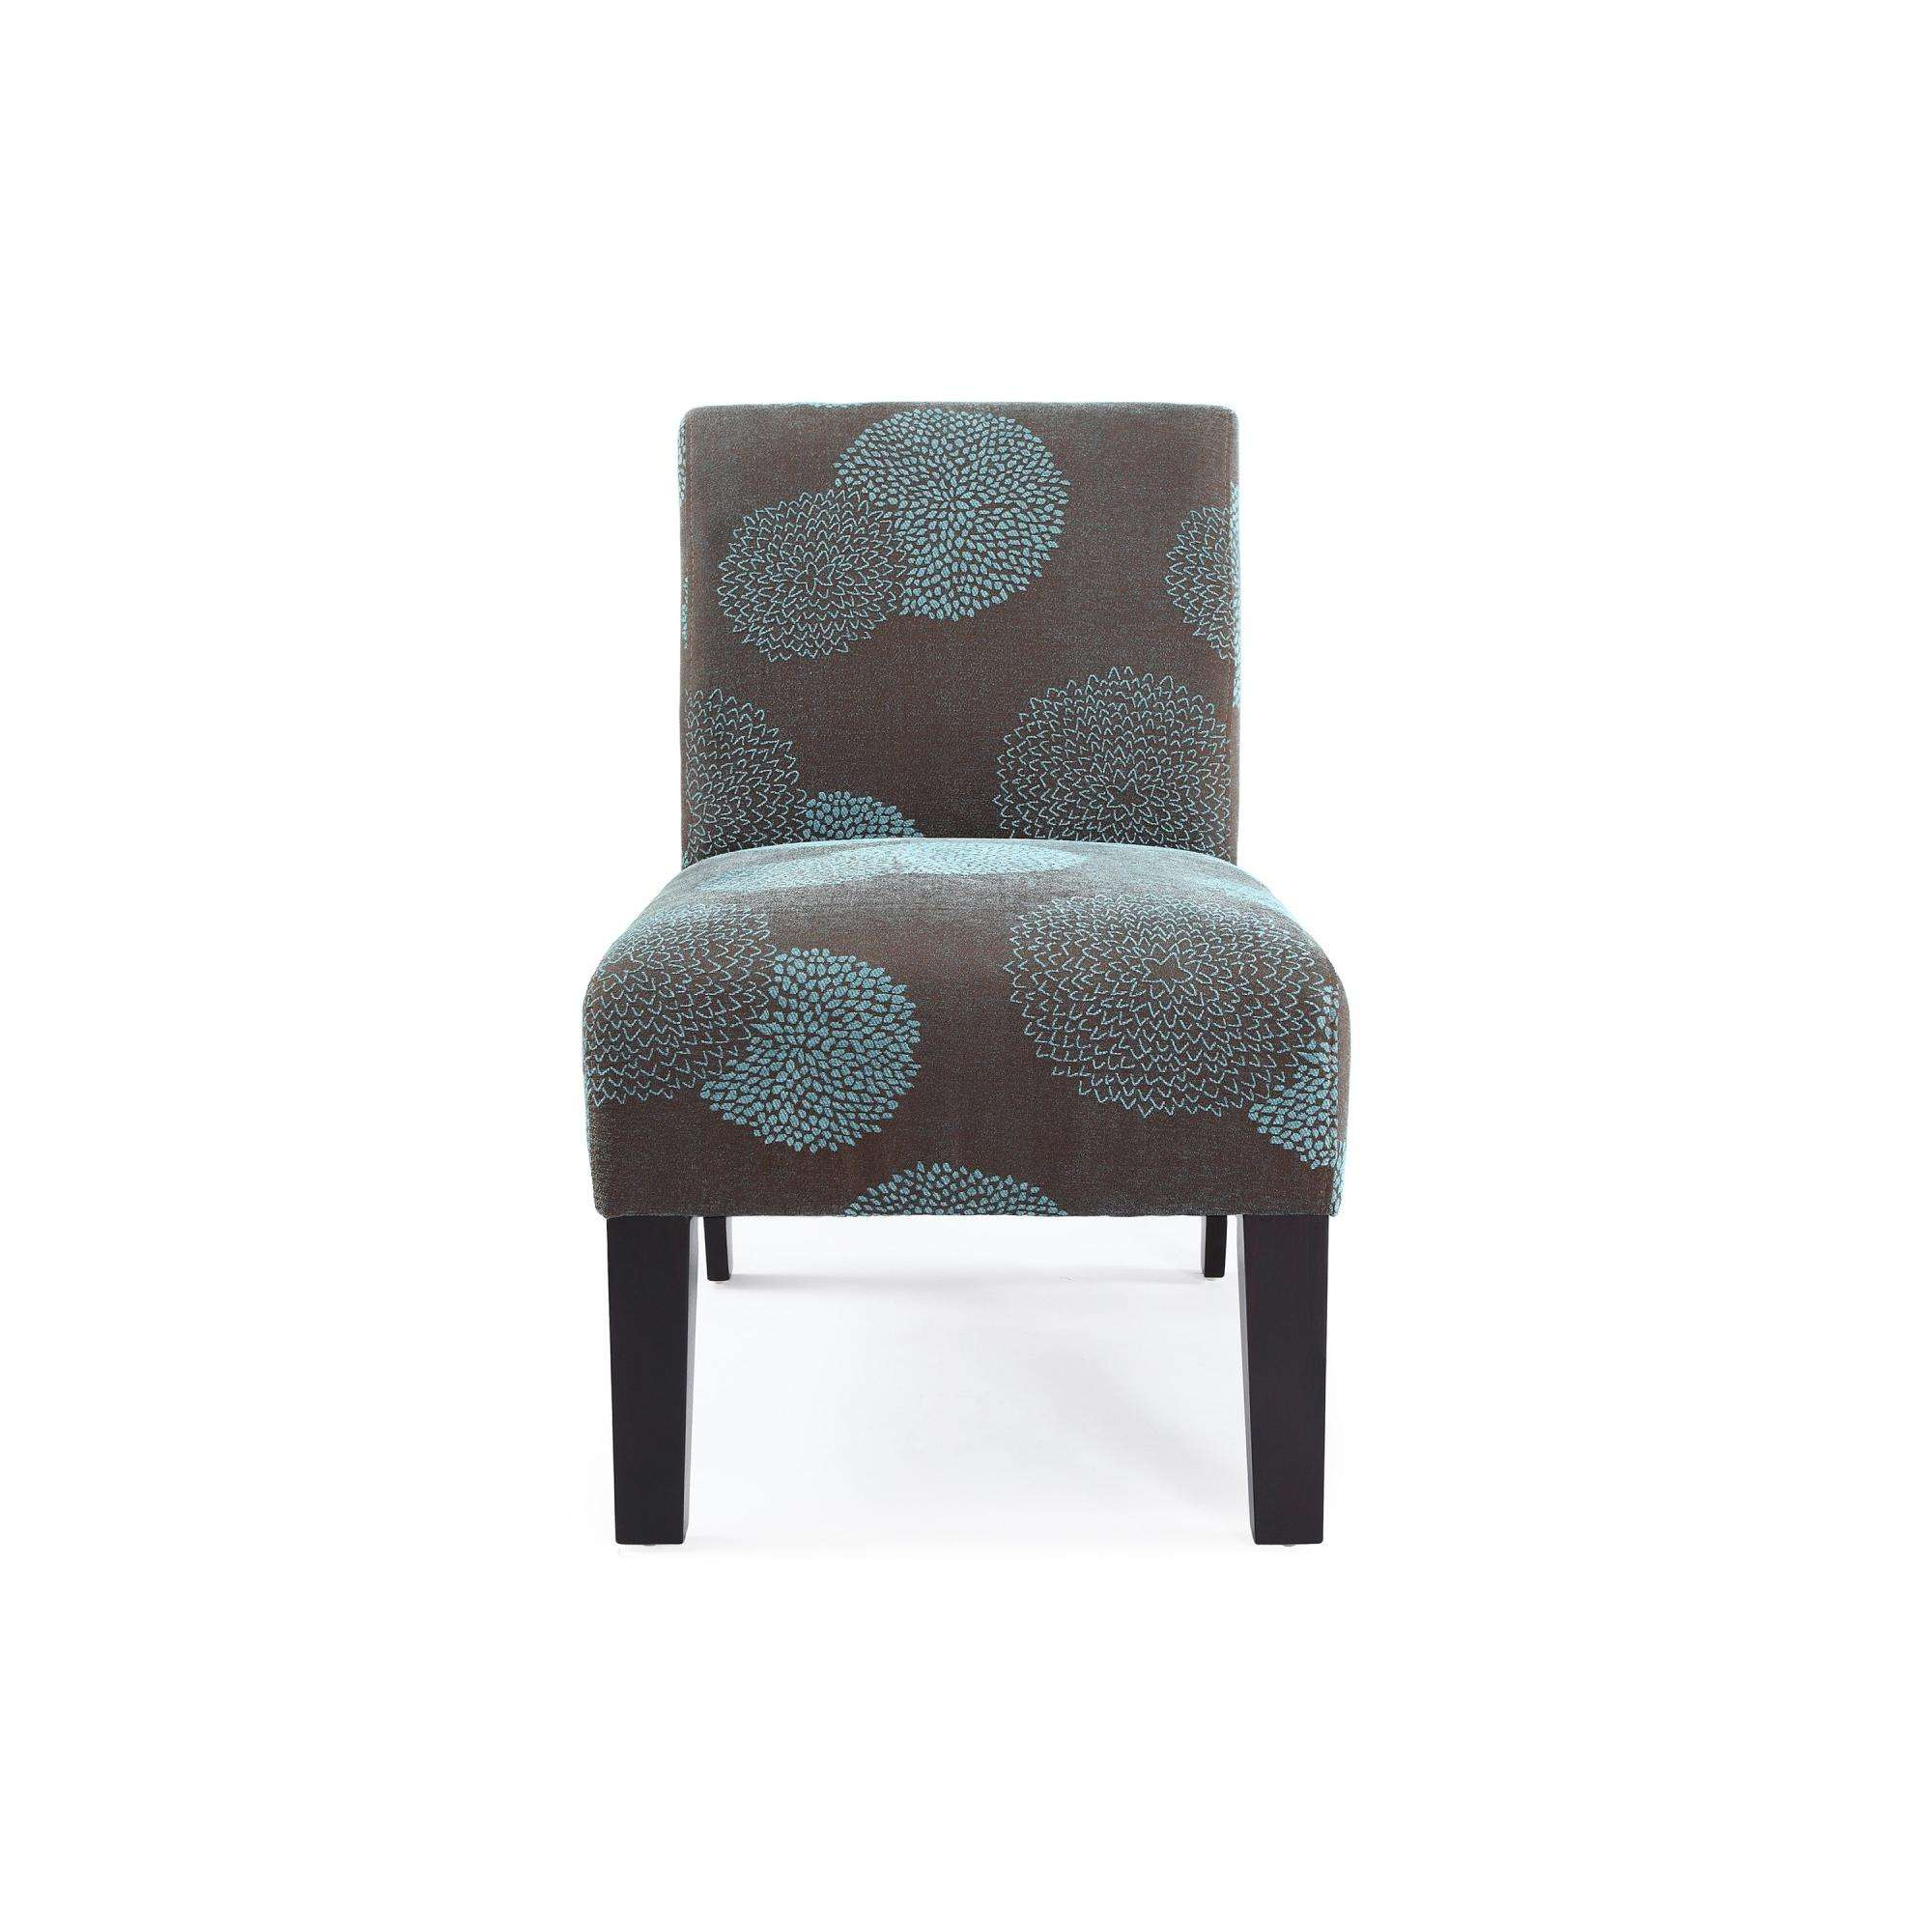 Sunflower Chair sunflower deco accent chair, multiple colors - walmart